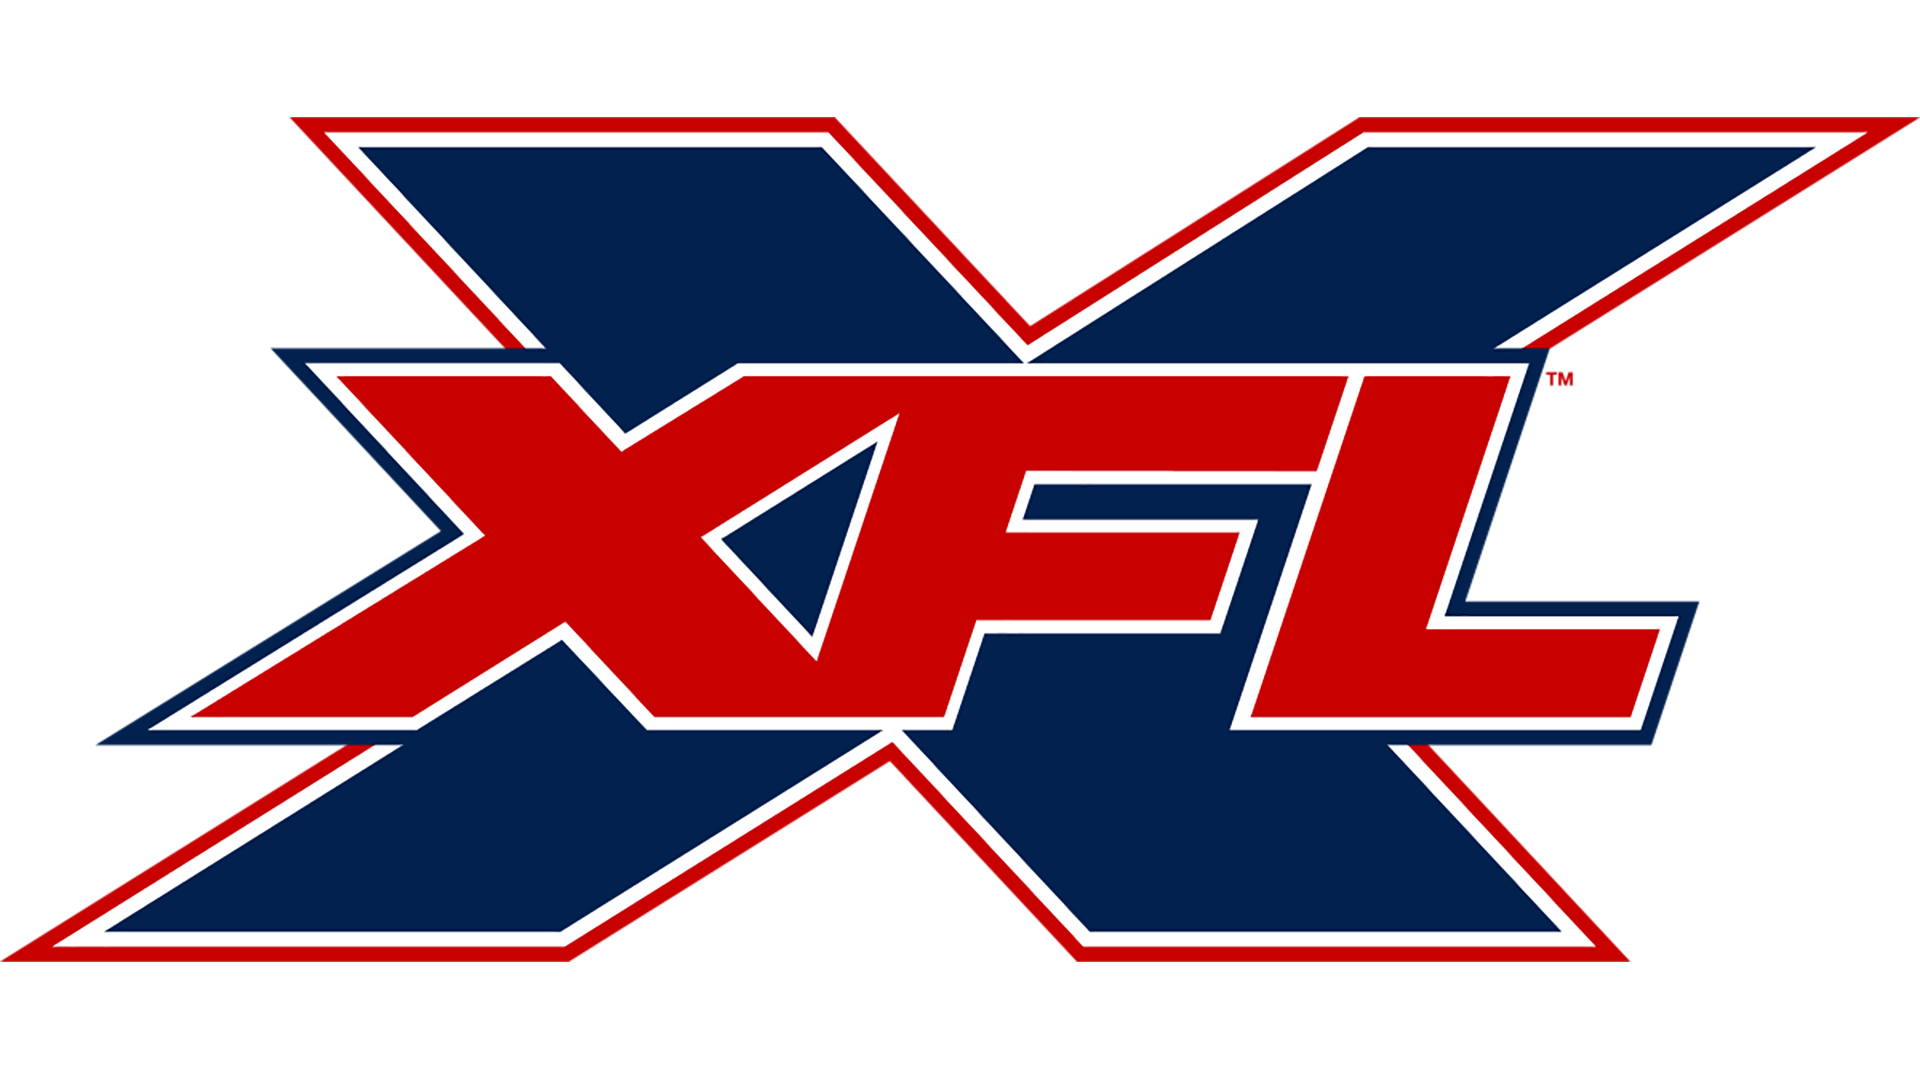 Xfl-logo-white-ftr_1rlmttogzqavn1jh47jxpf6j7x